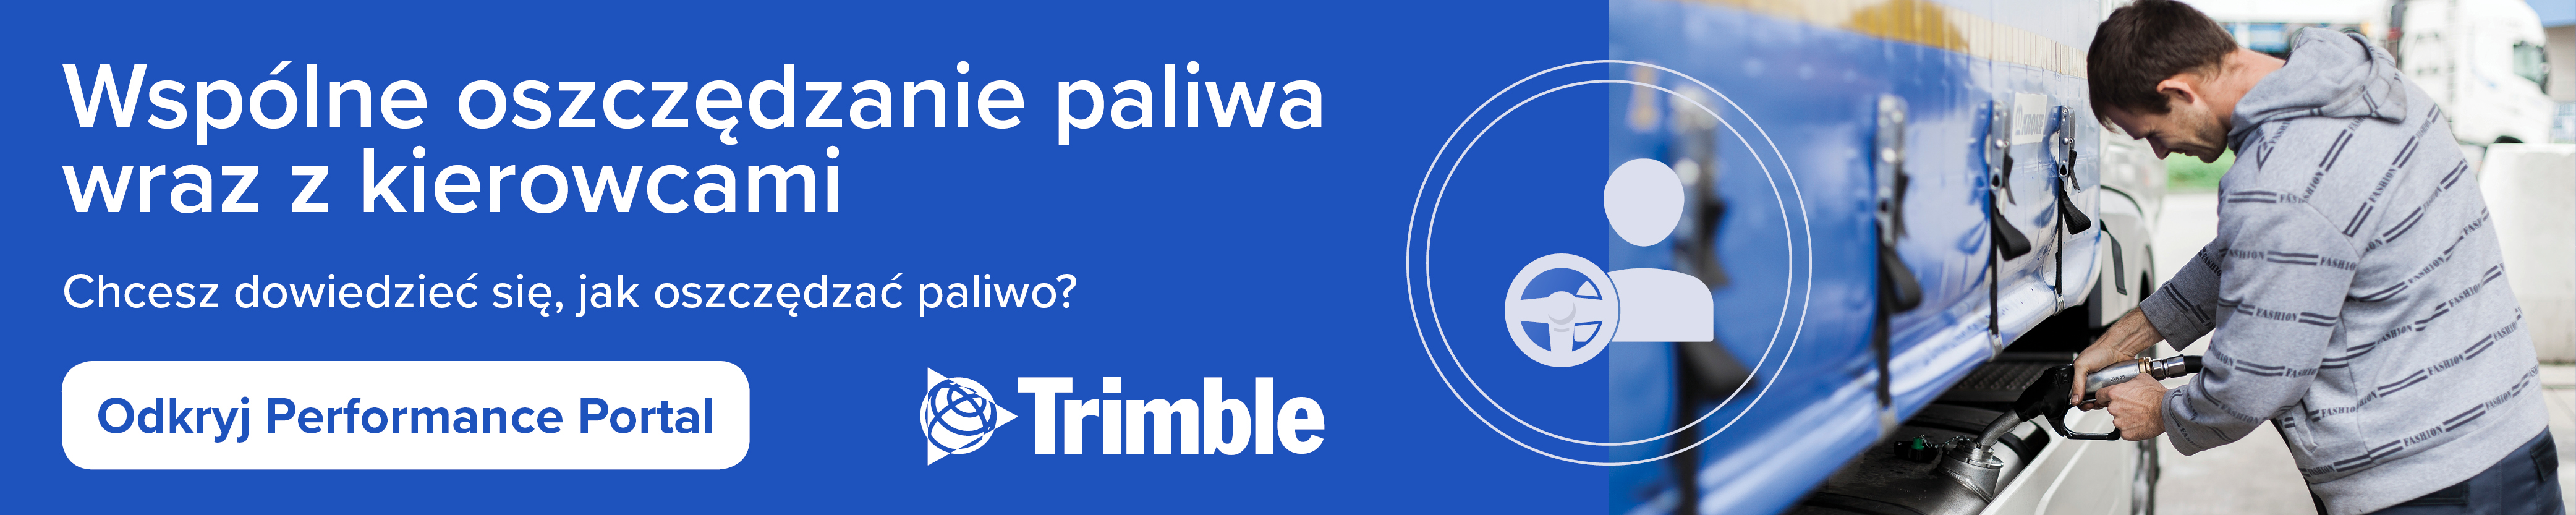 Trimble (od 13.03.20)